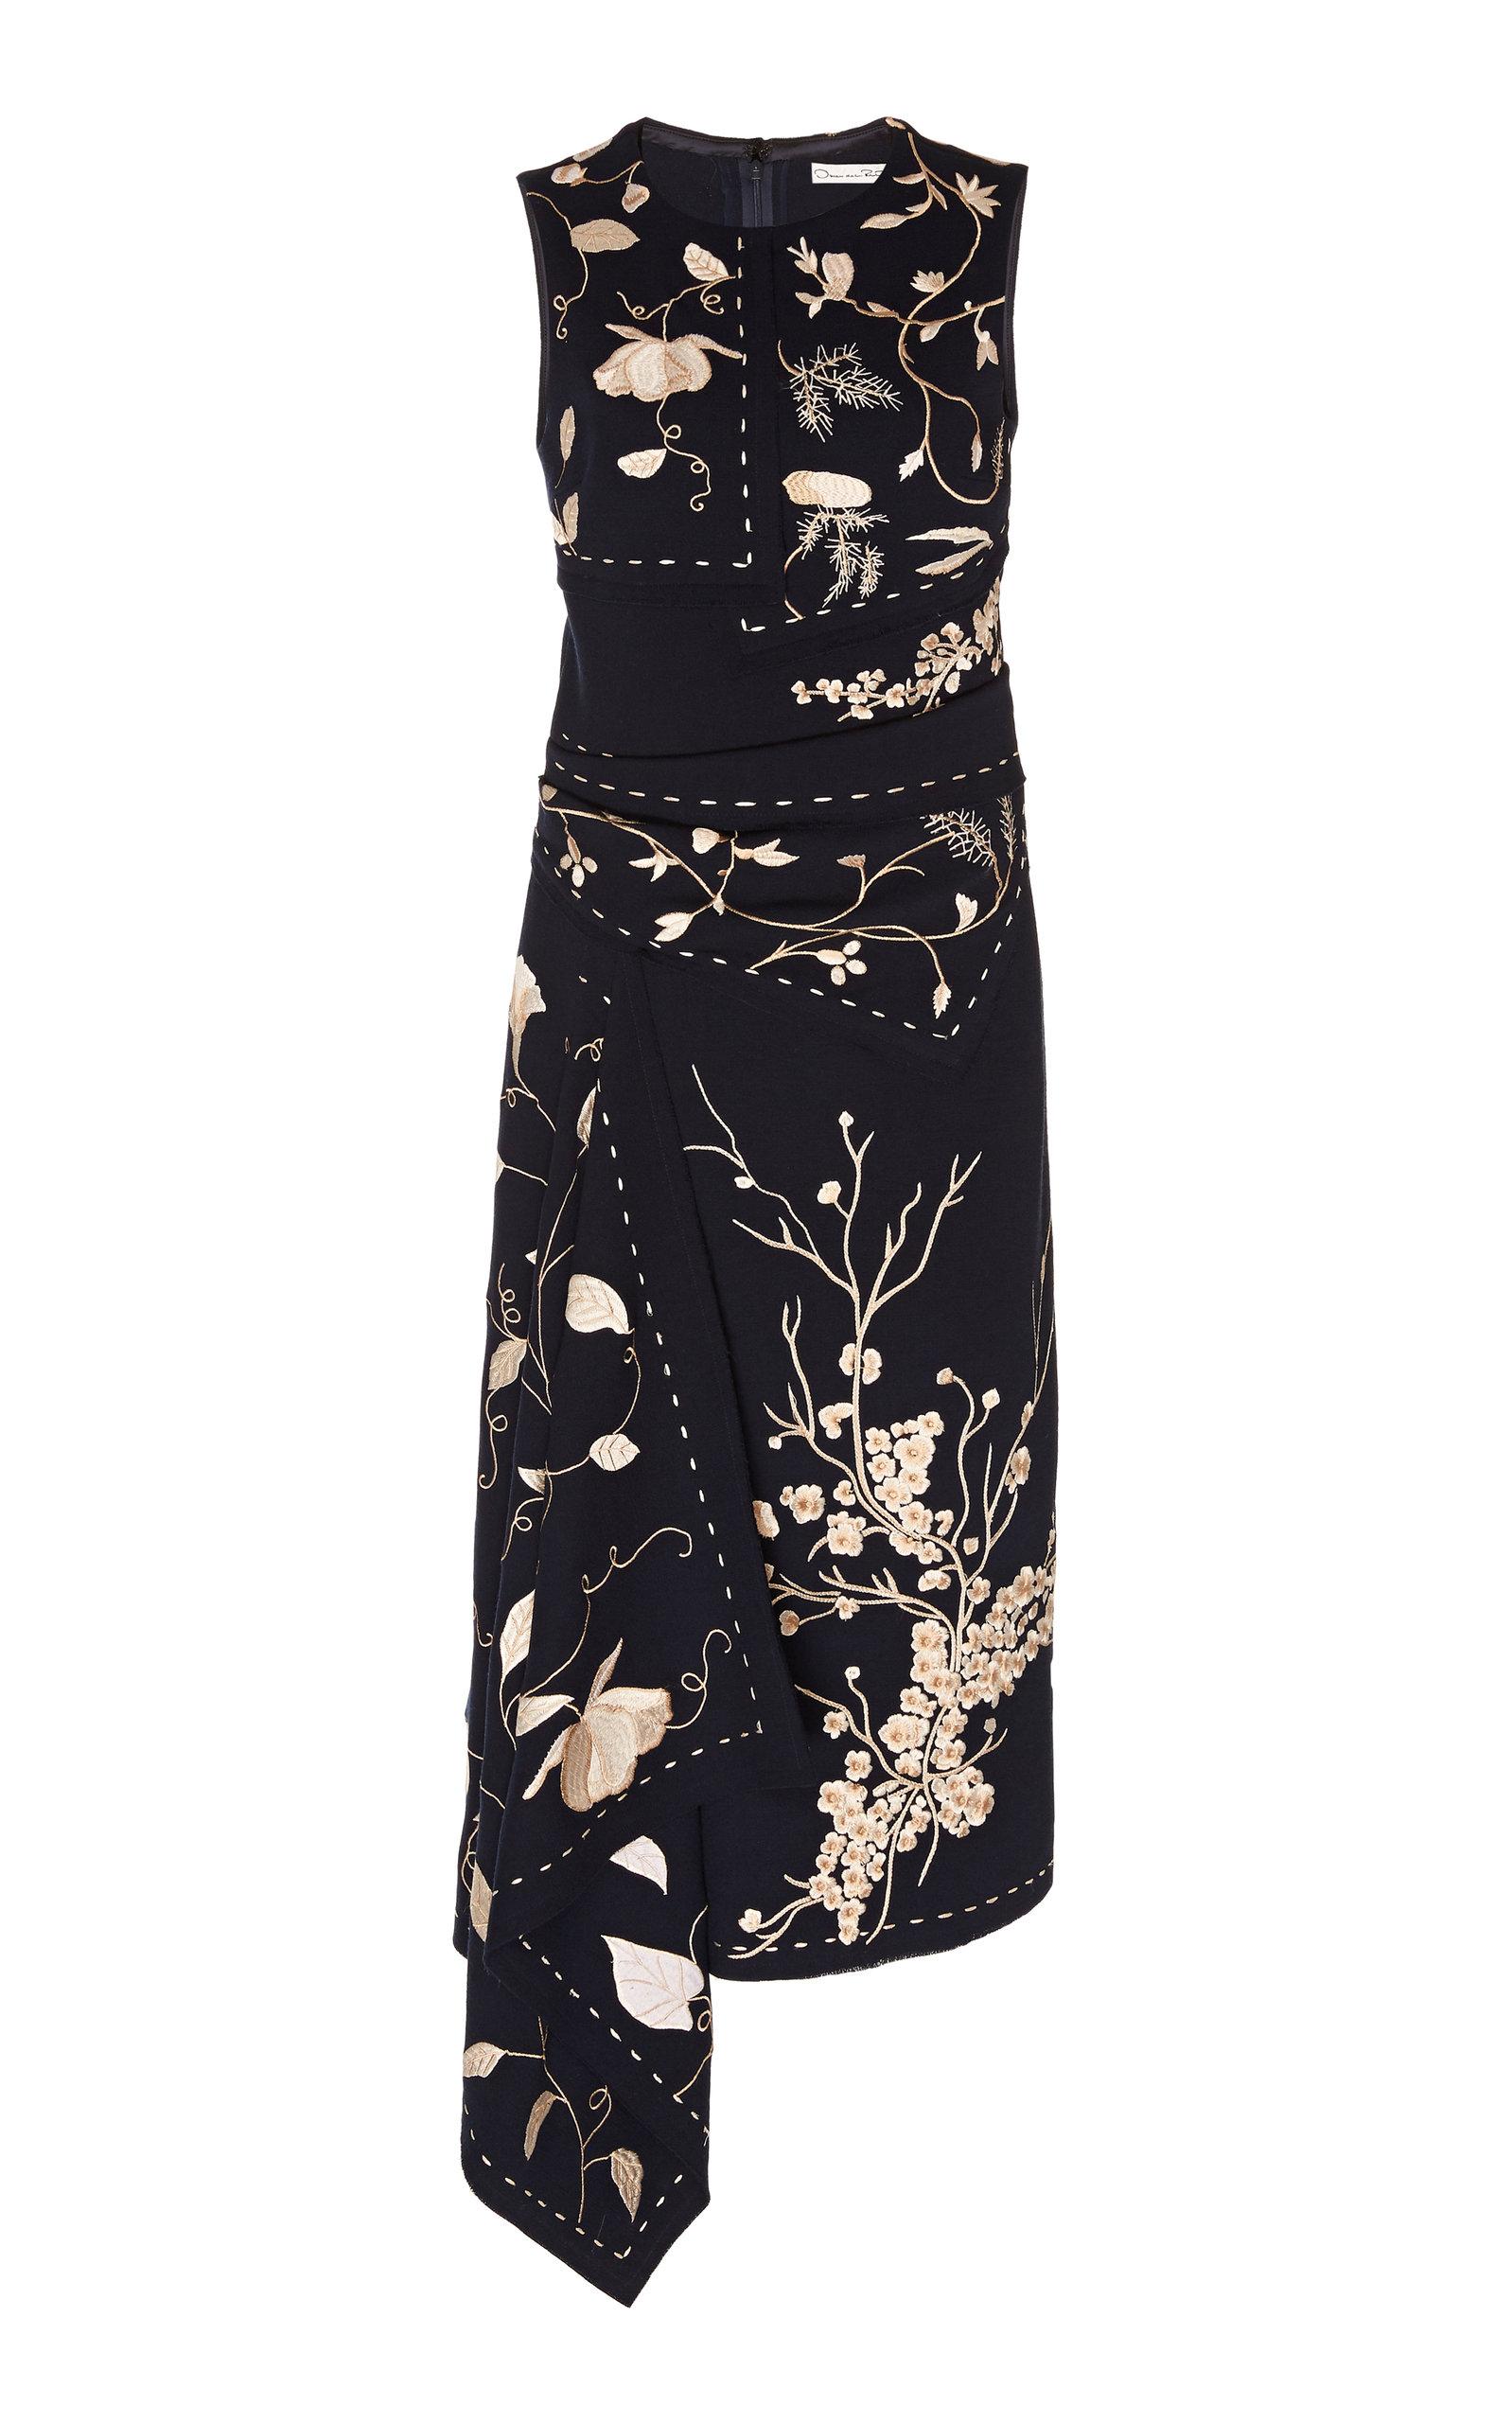 Buy Oscar de la Renta Embroidered Wool-Blend Midi Dress online, shop Oscar de la Renta at the best price